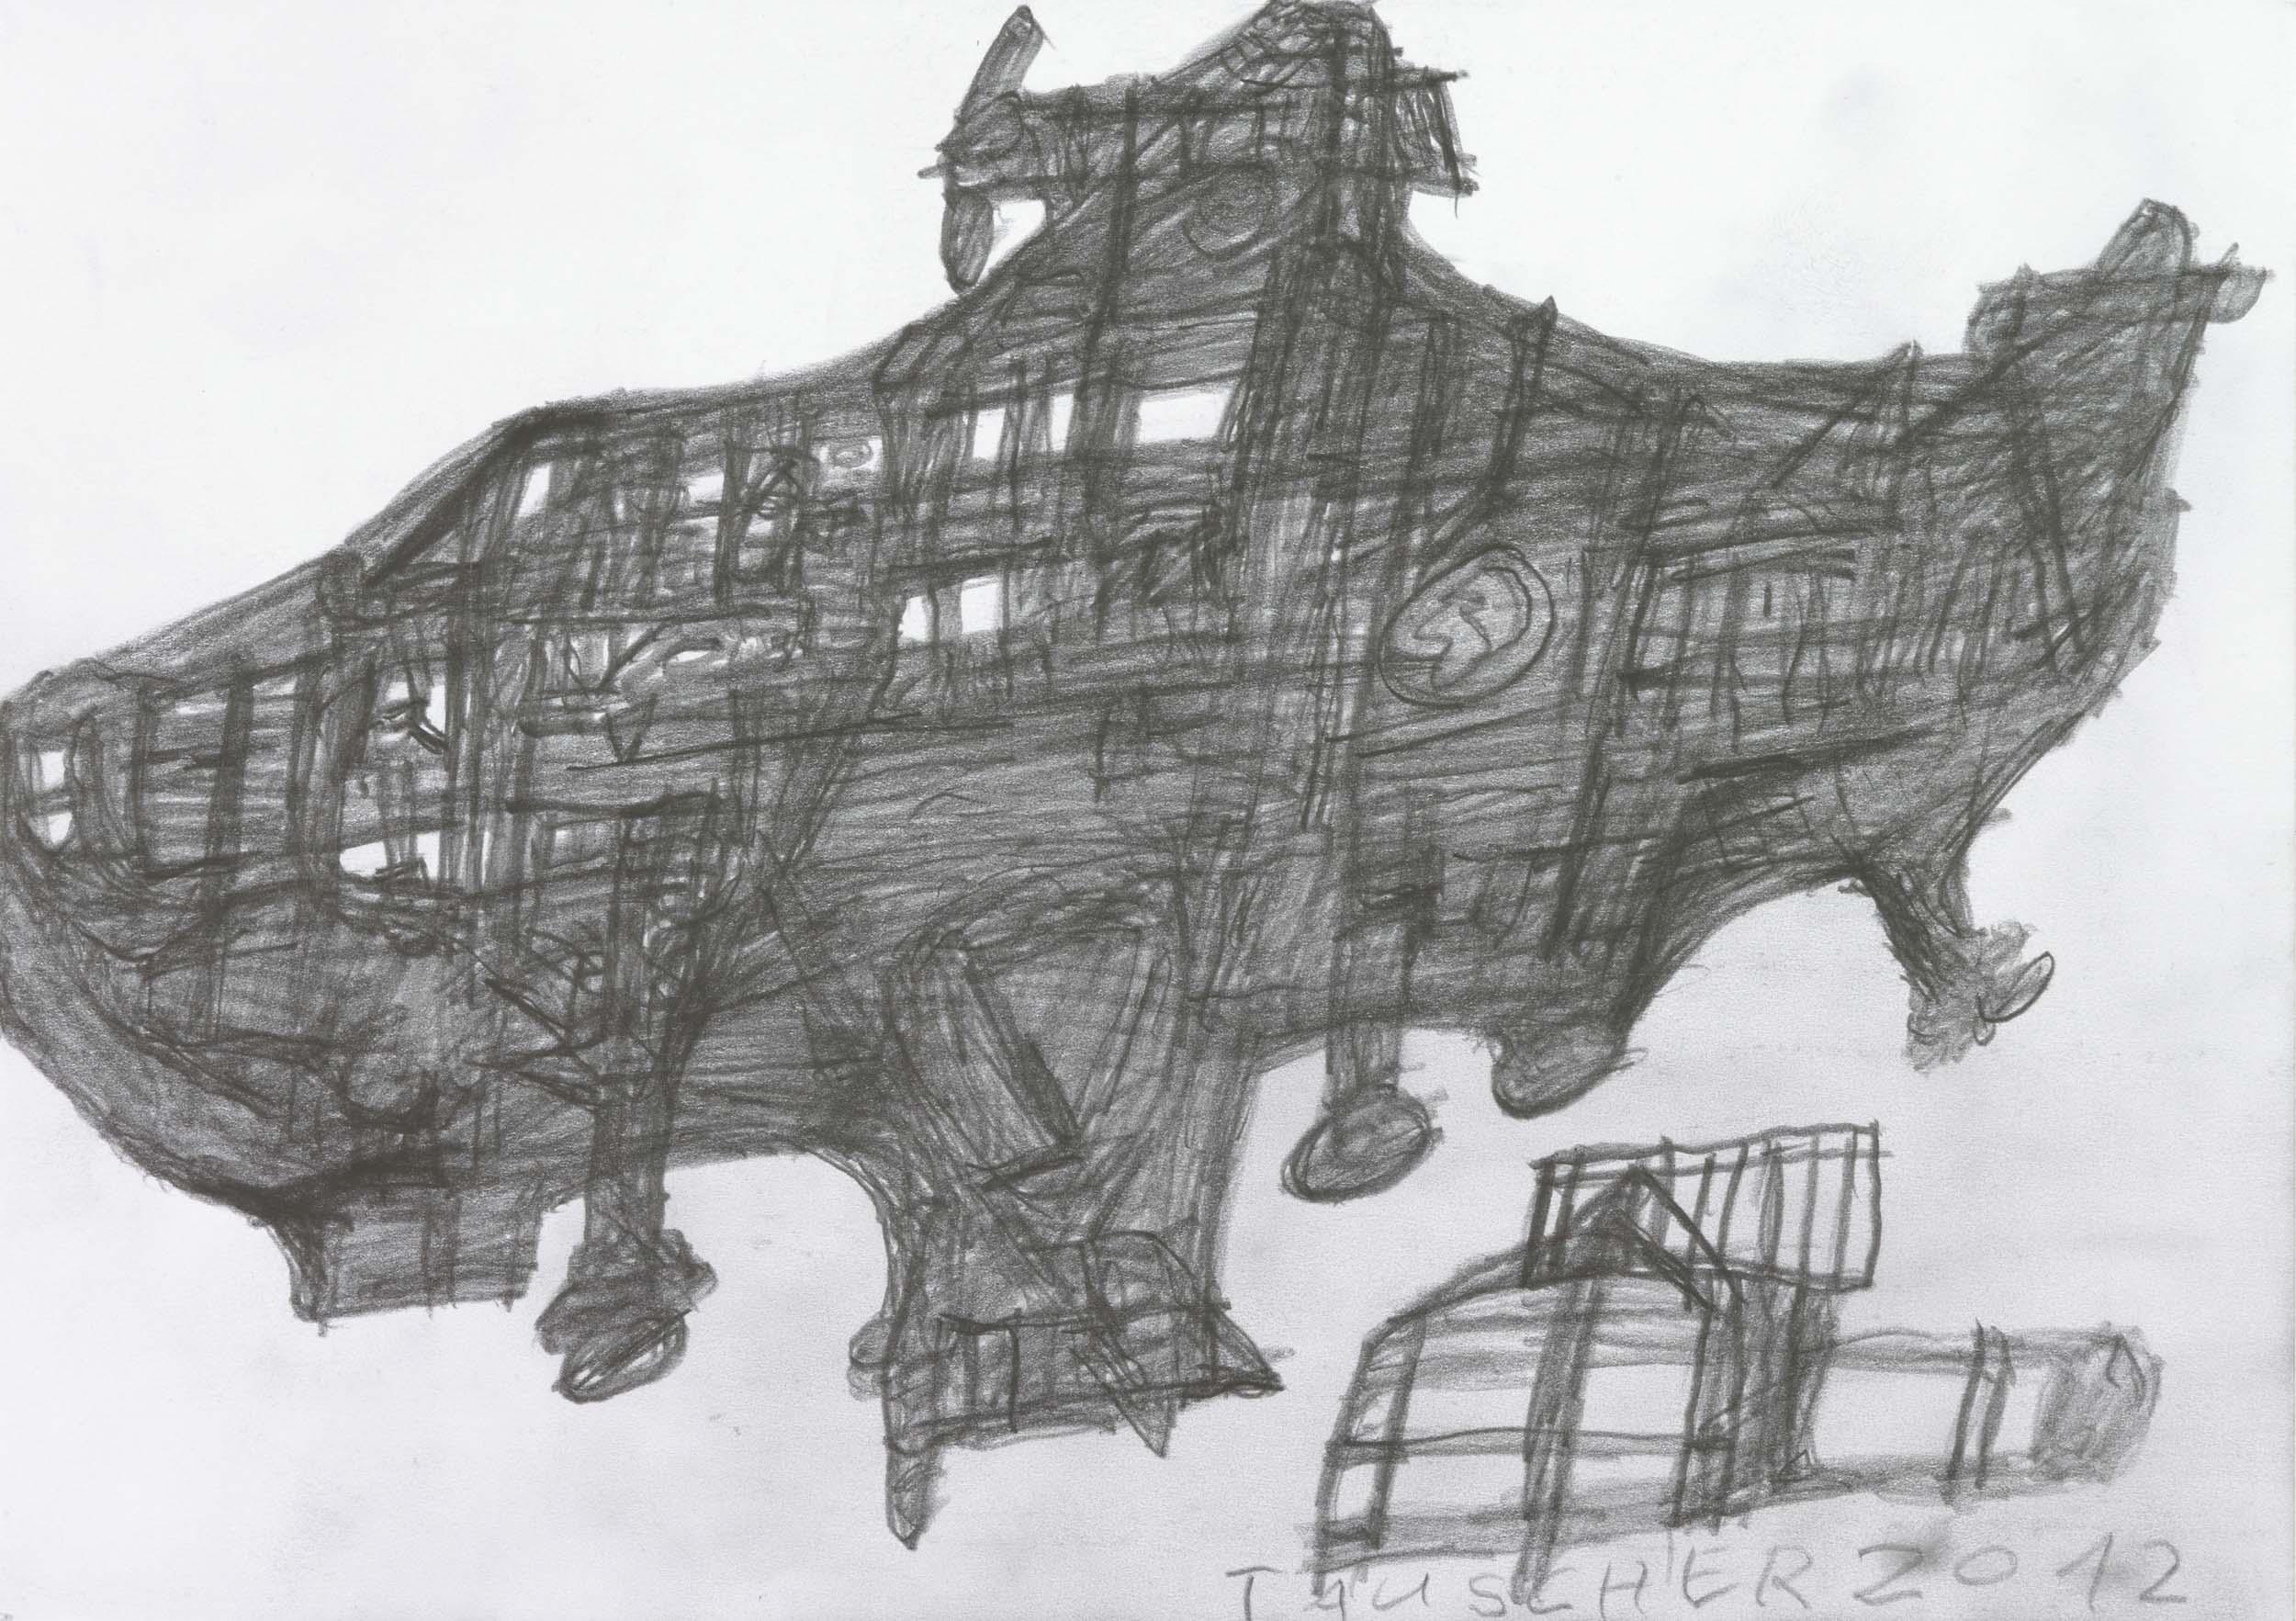 tauscher jürgen - flugobjekt / flying object